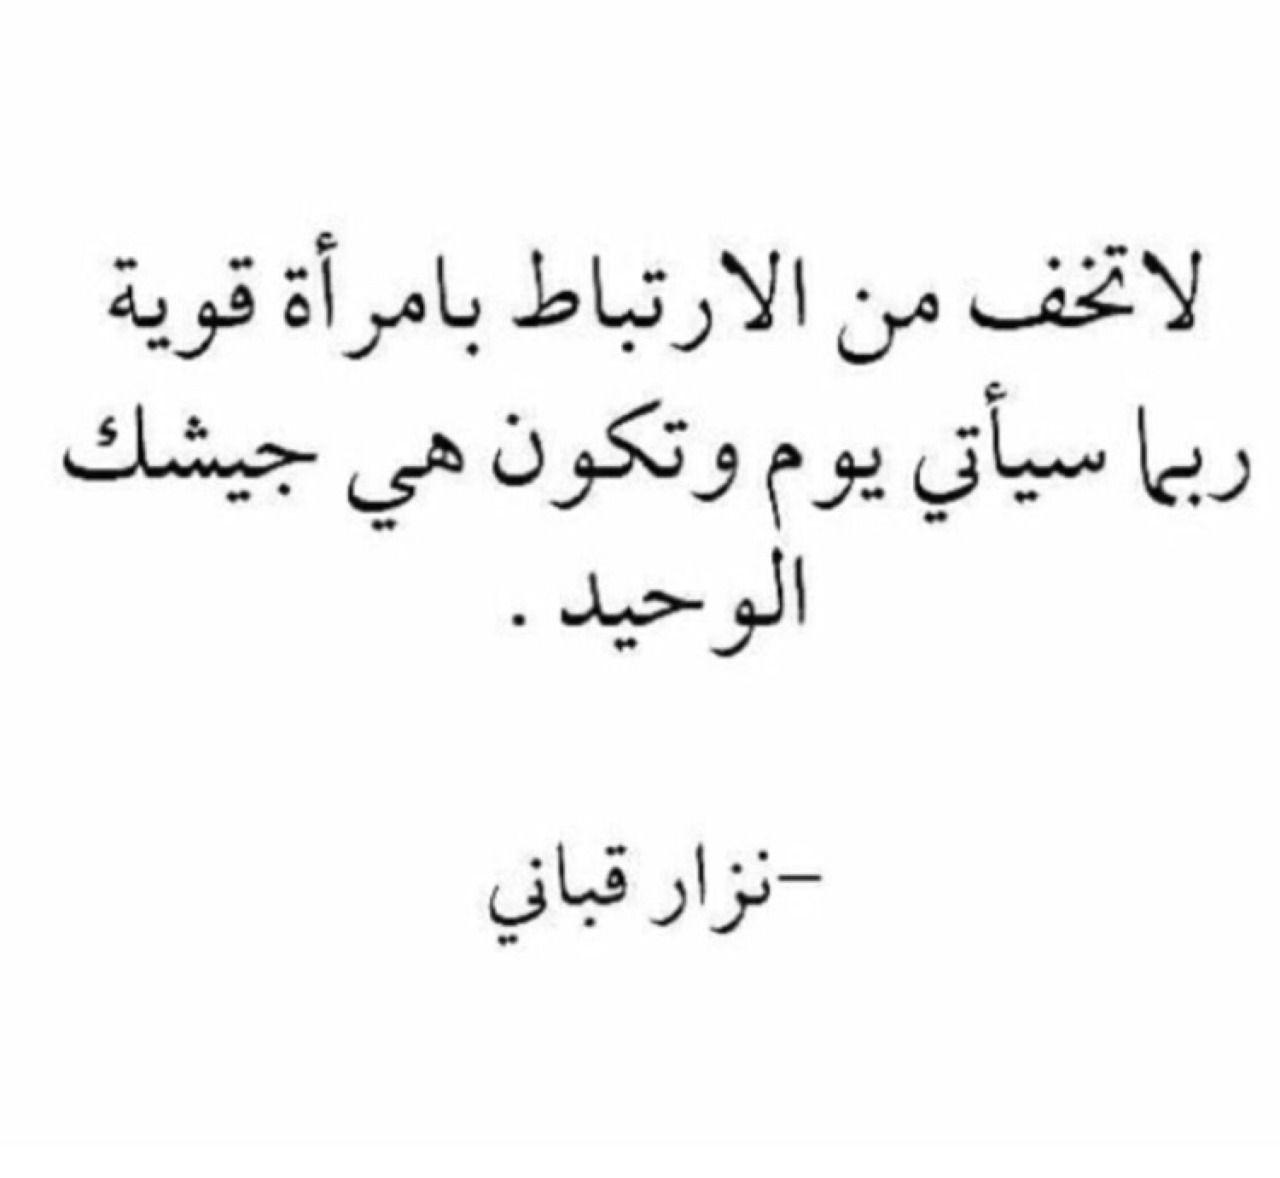 Rahaf Photo Words Quotes Wisdom Quotes Life Wisdom Quotes